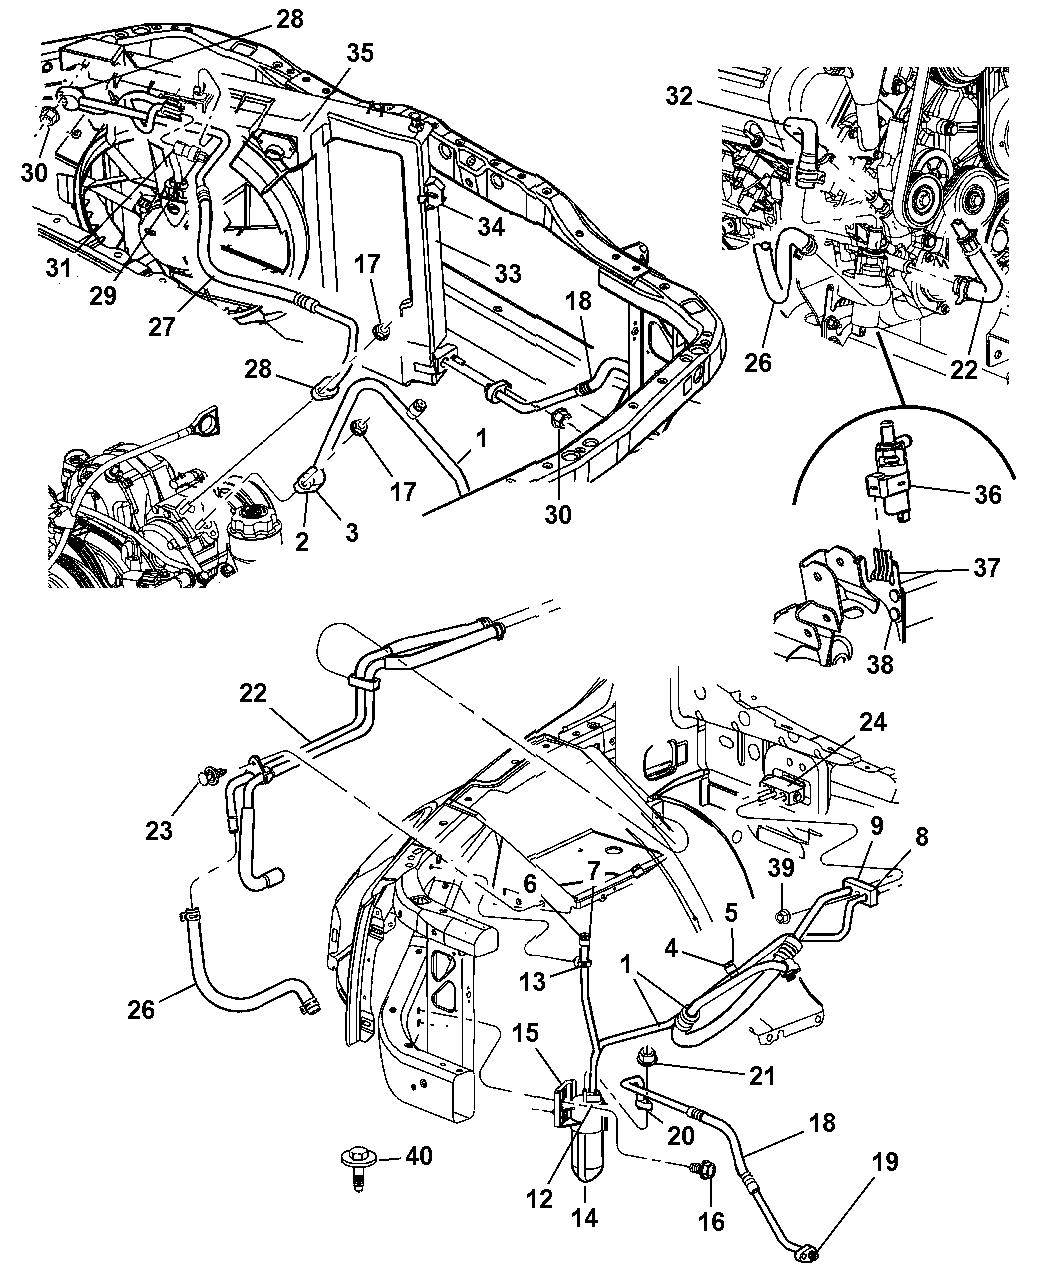 2007 Dodge Durango Parts Diagrams • Wiring Diagram For Free